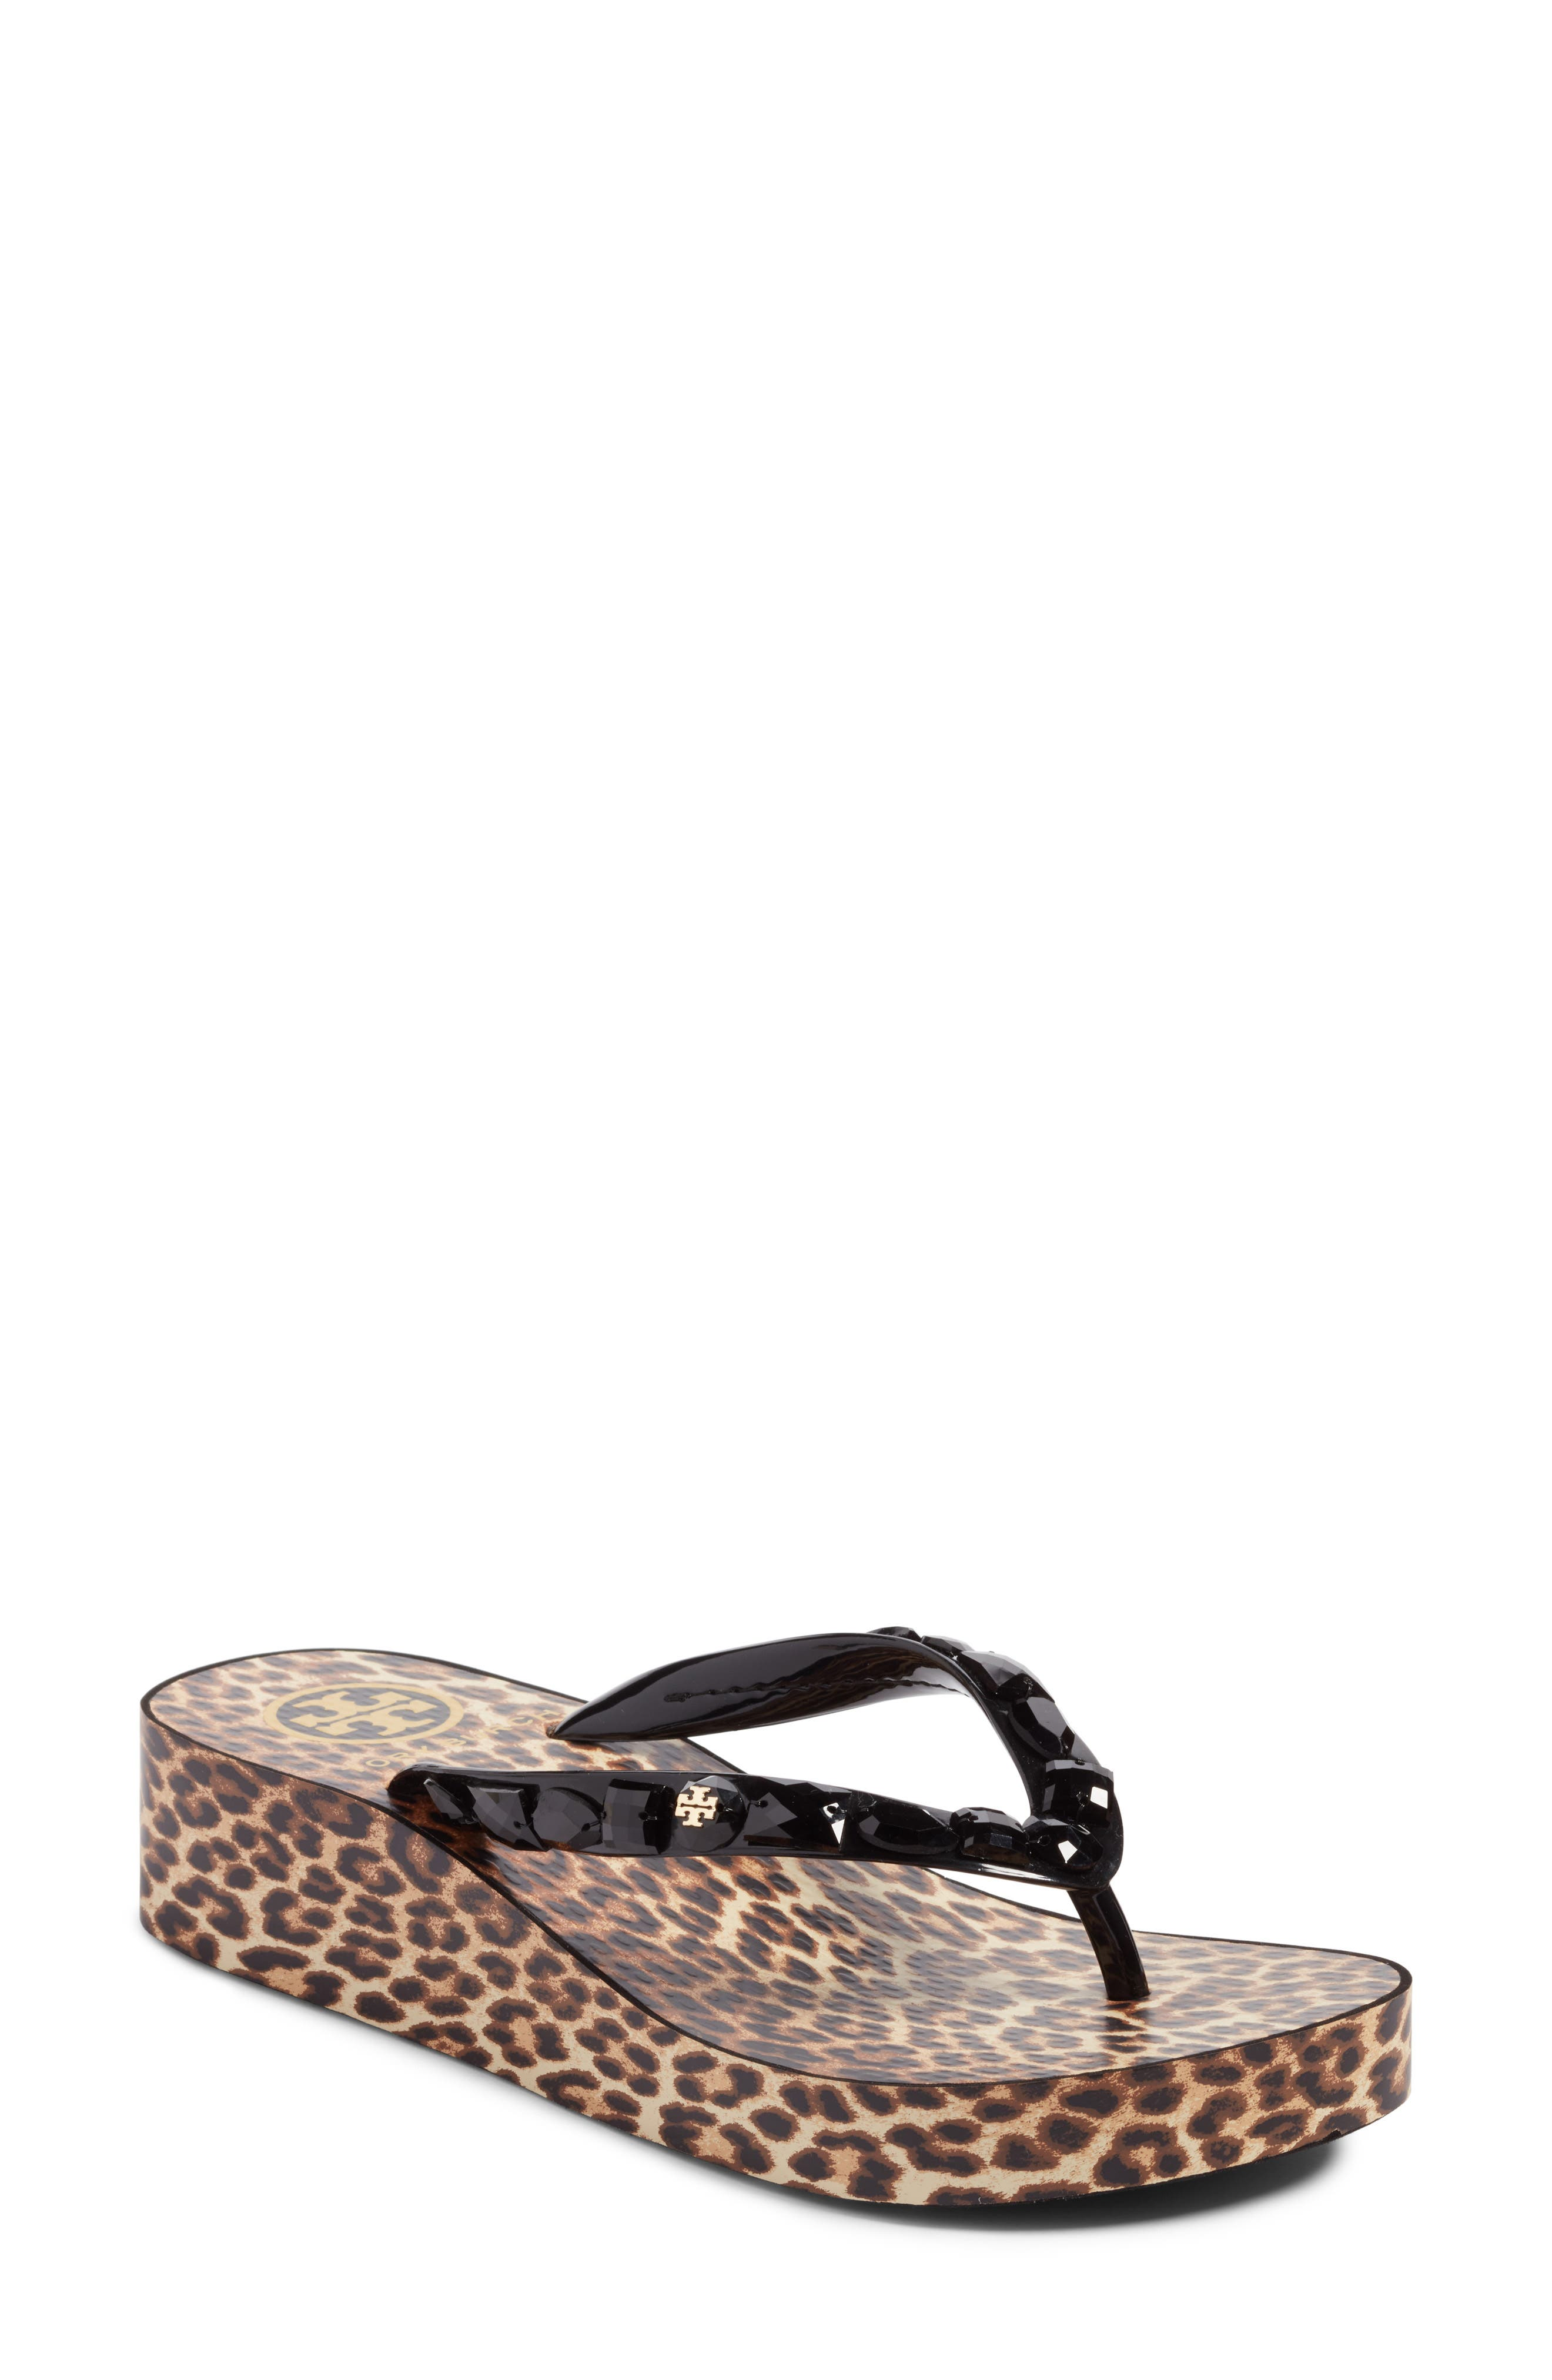 c1cd3c339f6 Buy michael kors flip flops womens 2014   OFF65% Discounted